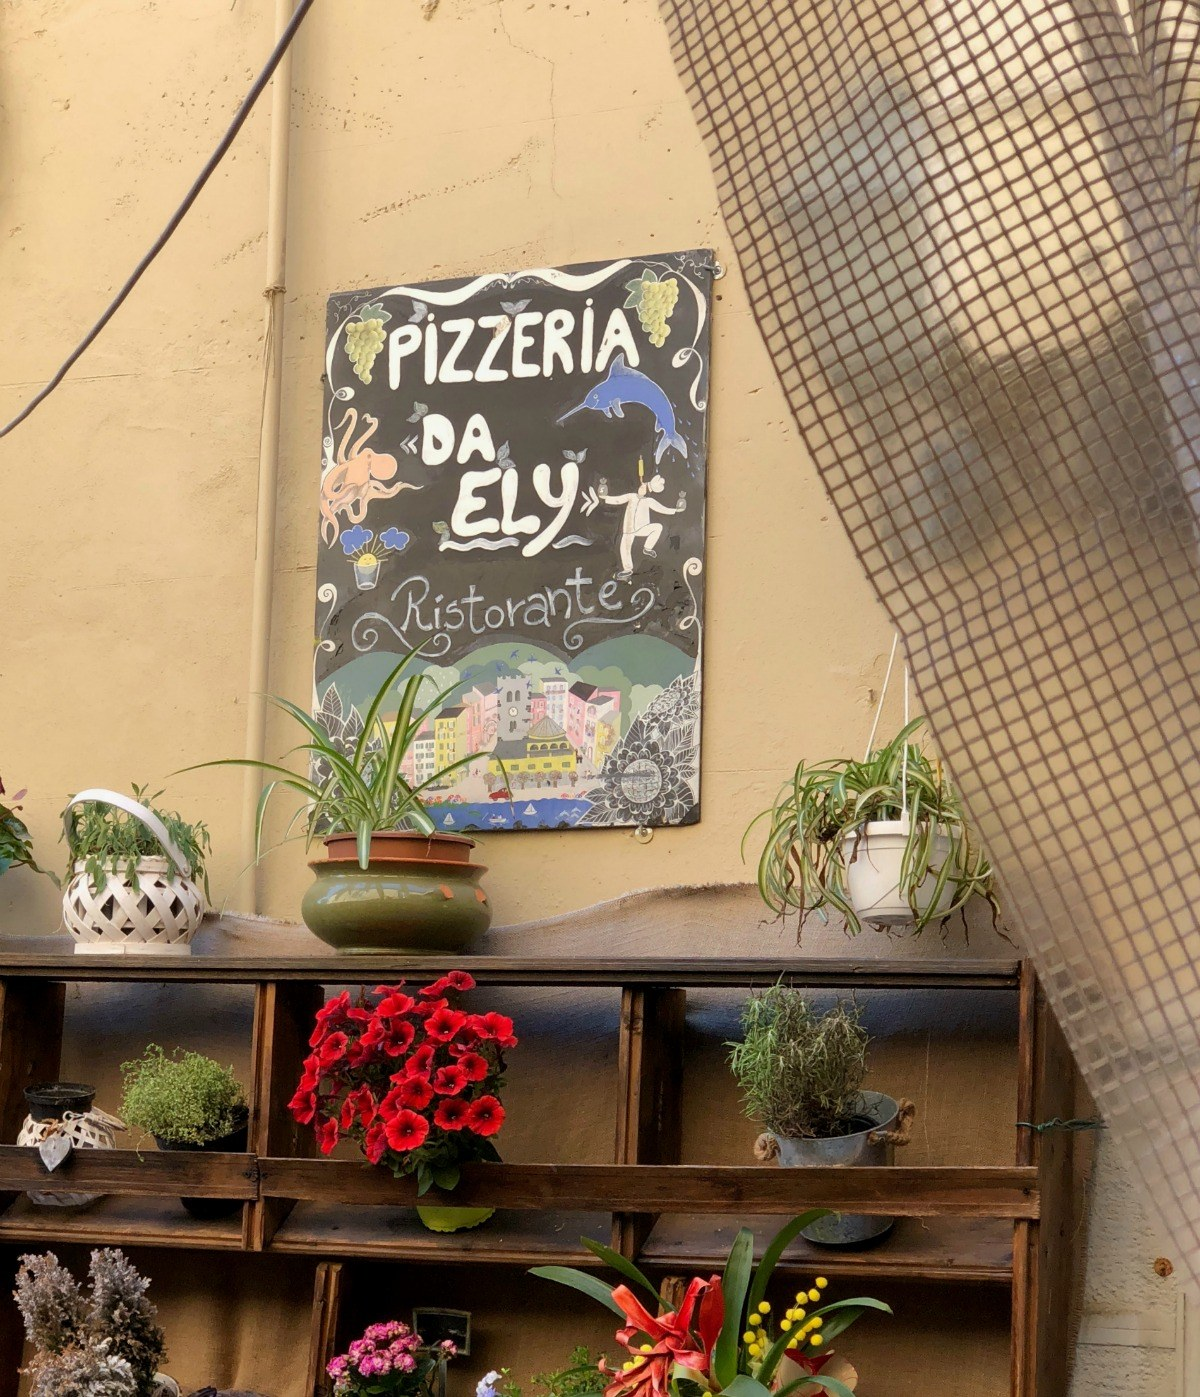 pizzeria da ely ristorante